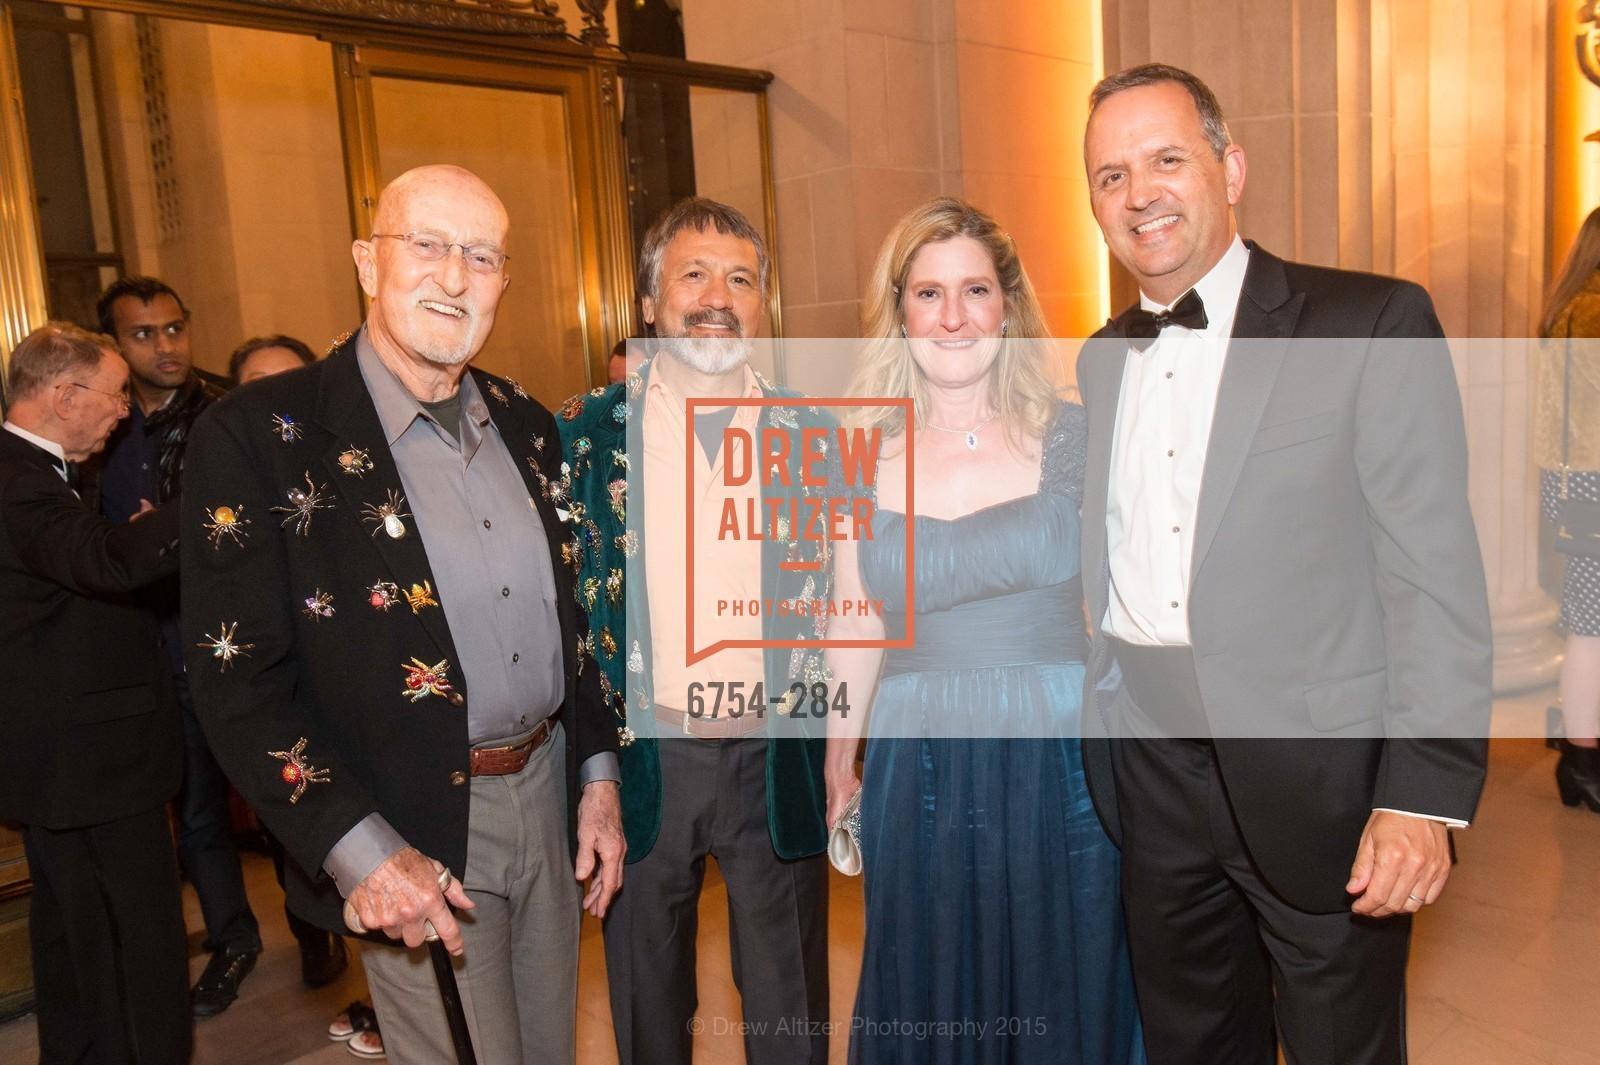 Raja Hart, Felipe Rubio, Donna Digiuseppe, Rick Matcovich, Opera Ball 2015: Moonlight & Music, War Memorial Opera House. 301 Van Ness Ave, September 11th, 2015